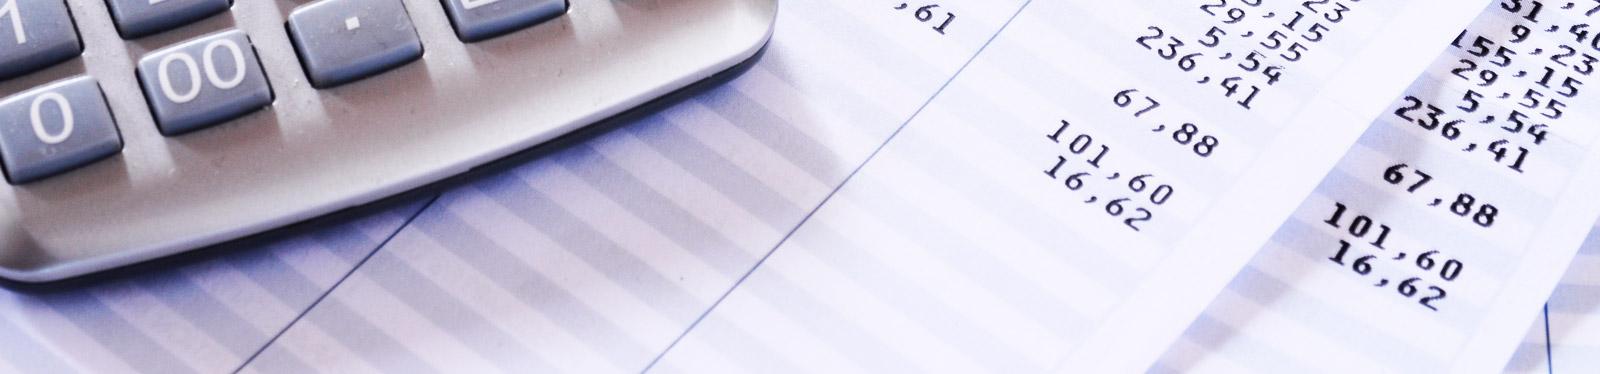 terceirizacao-folha-de-pagamento